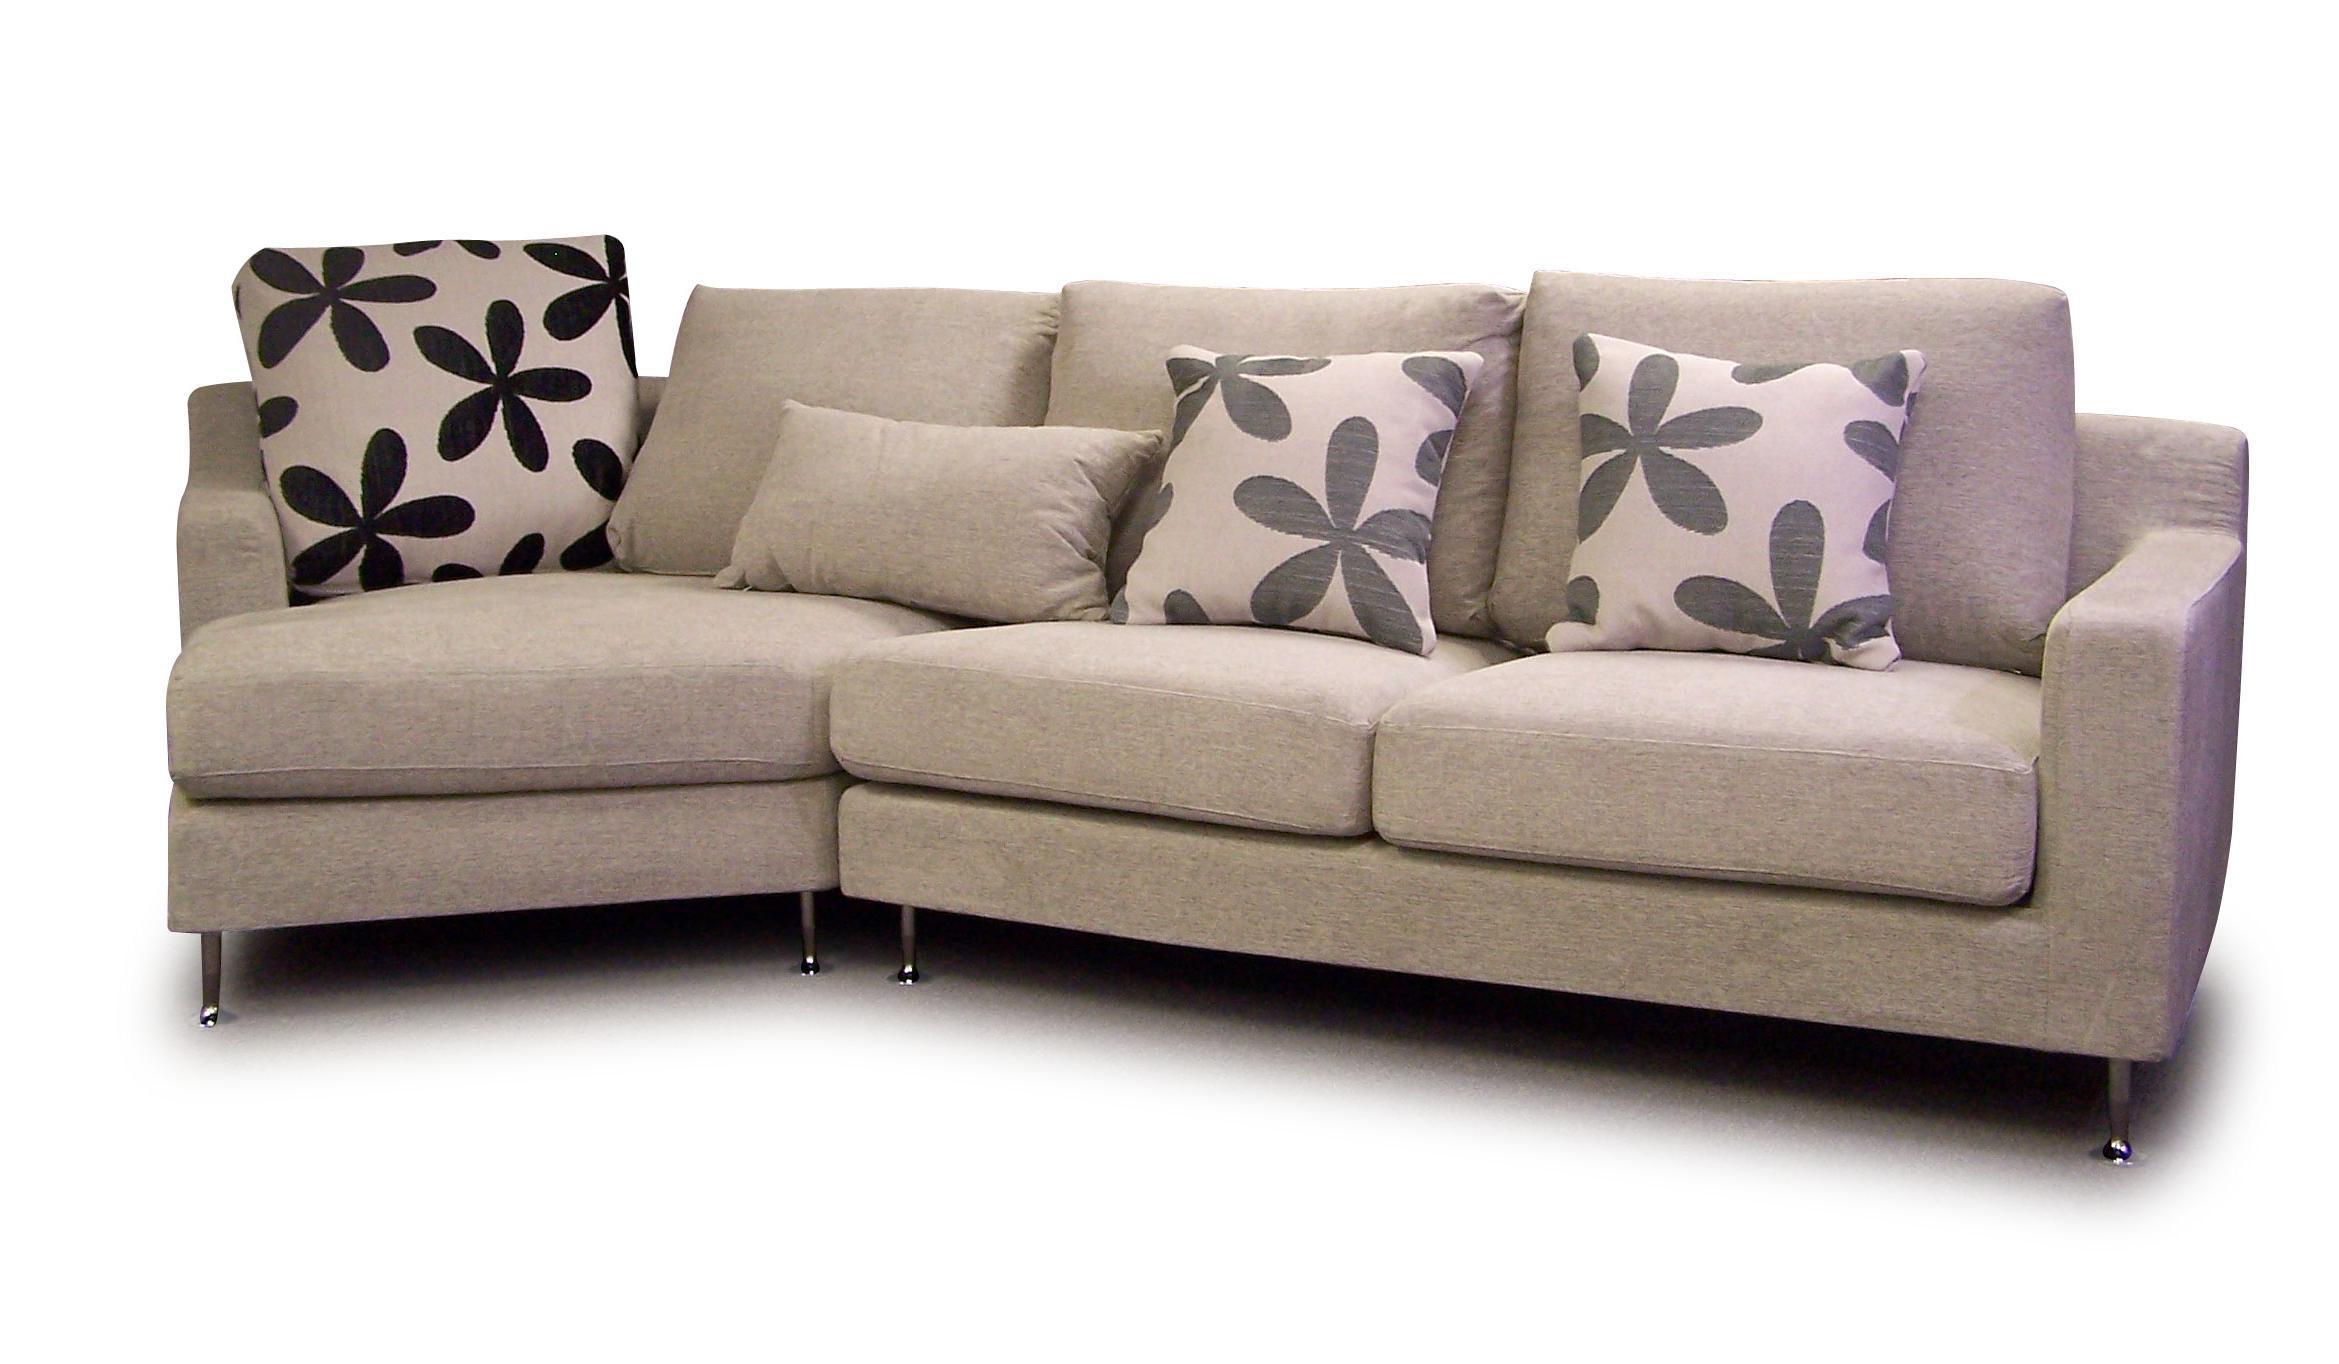 20 photos floral sofas sofa ideas. Black Bedroom Furniture Sets. Home Design Ideas